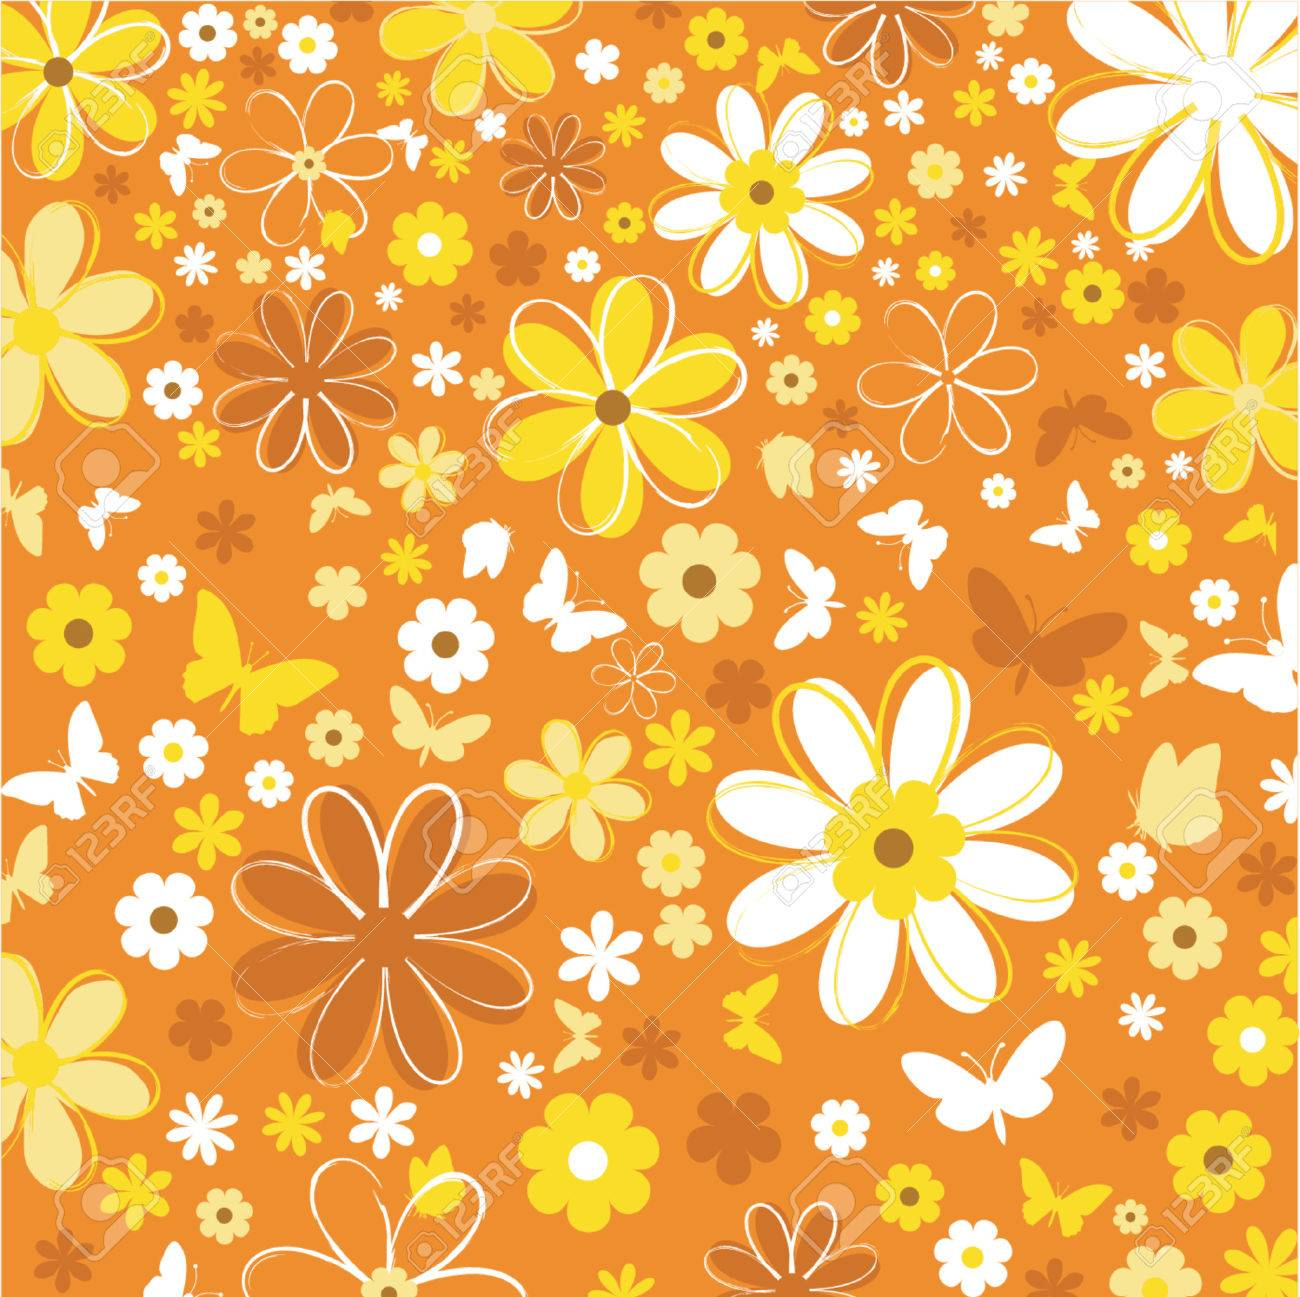 Flowers and butterflies - vector Stock Vector - 417258